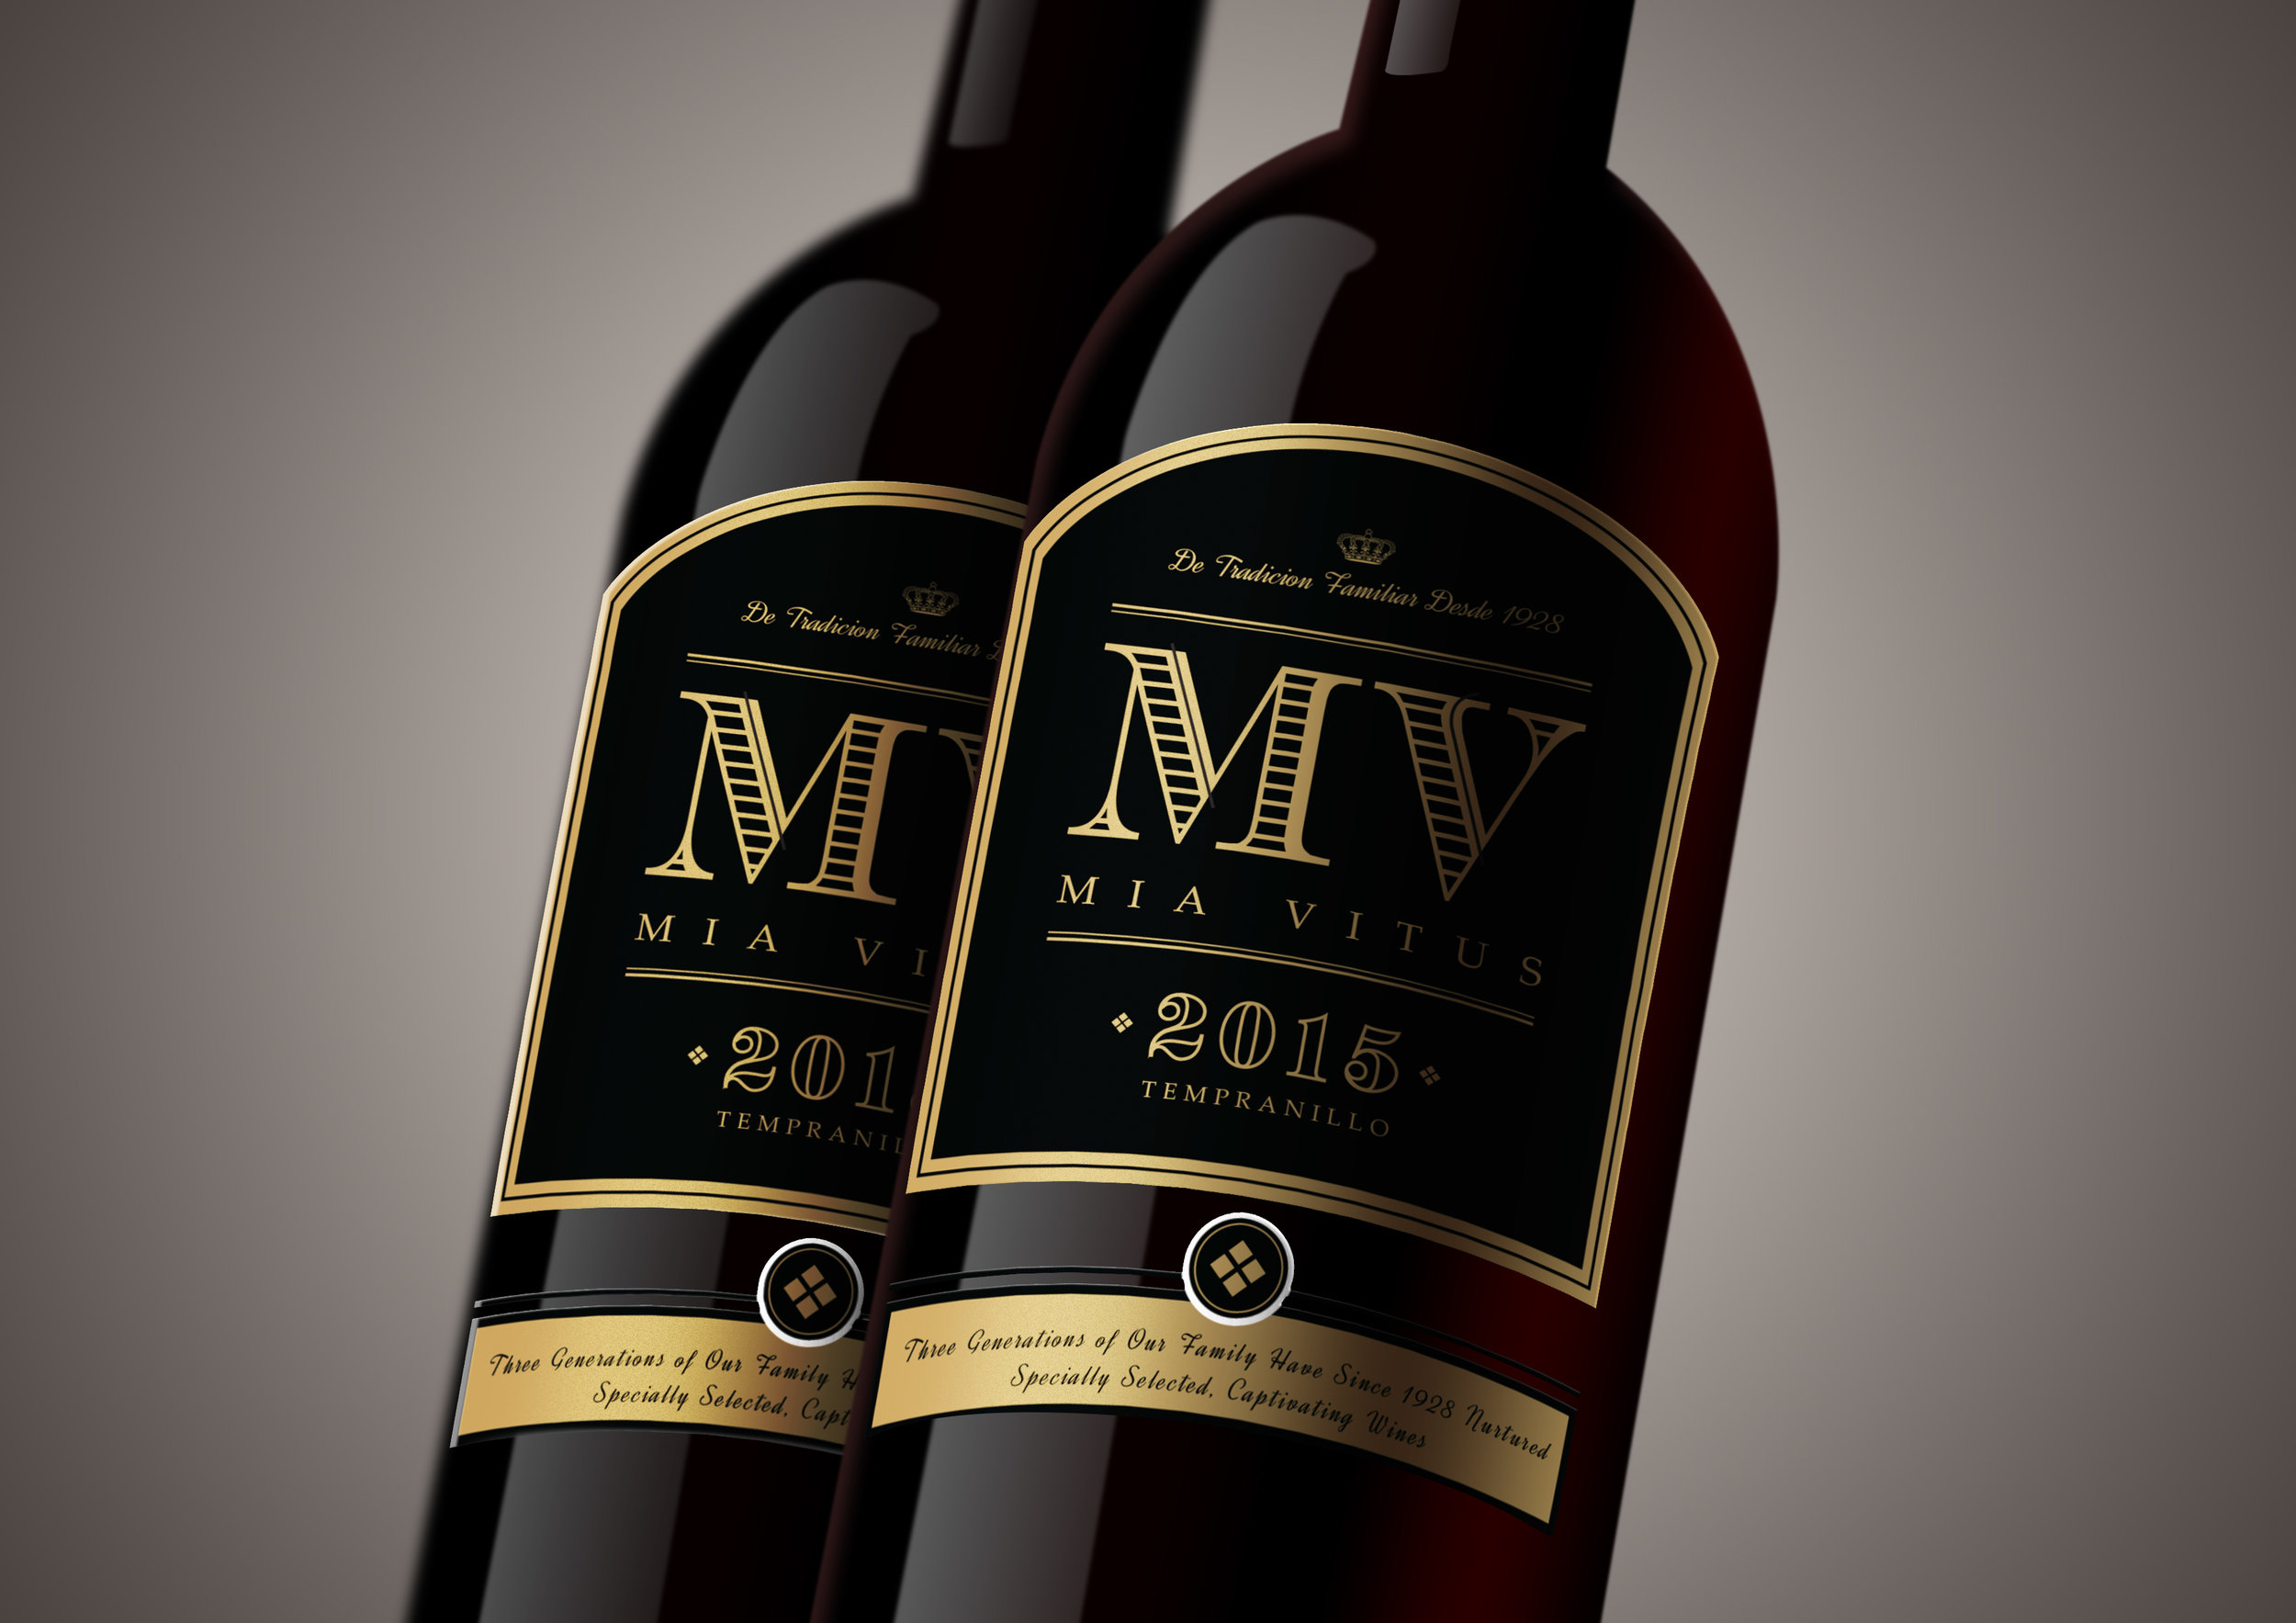 Mia Vitus 2 bottle shot.jpg